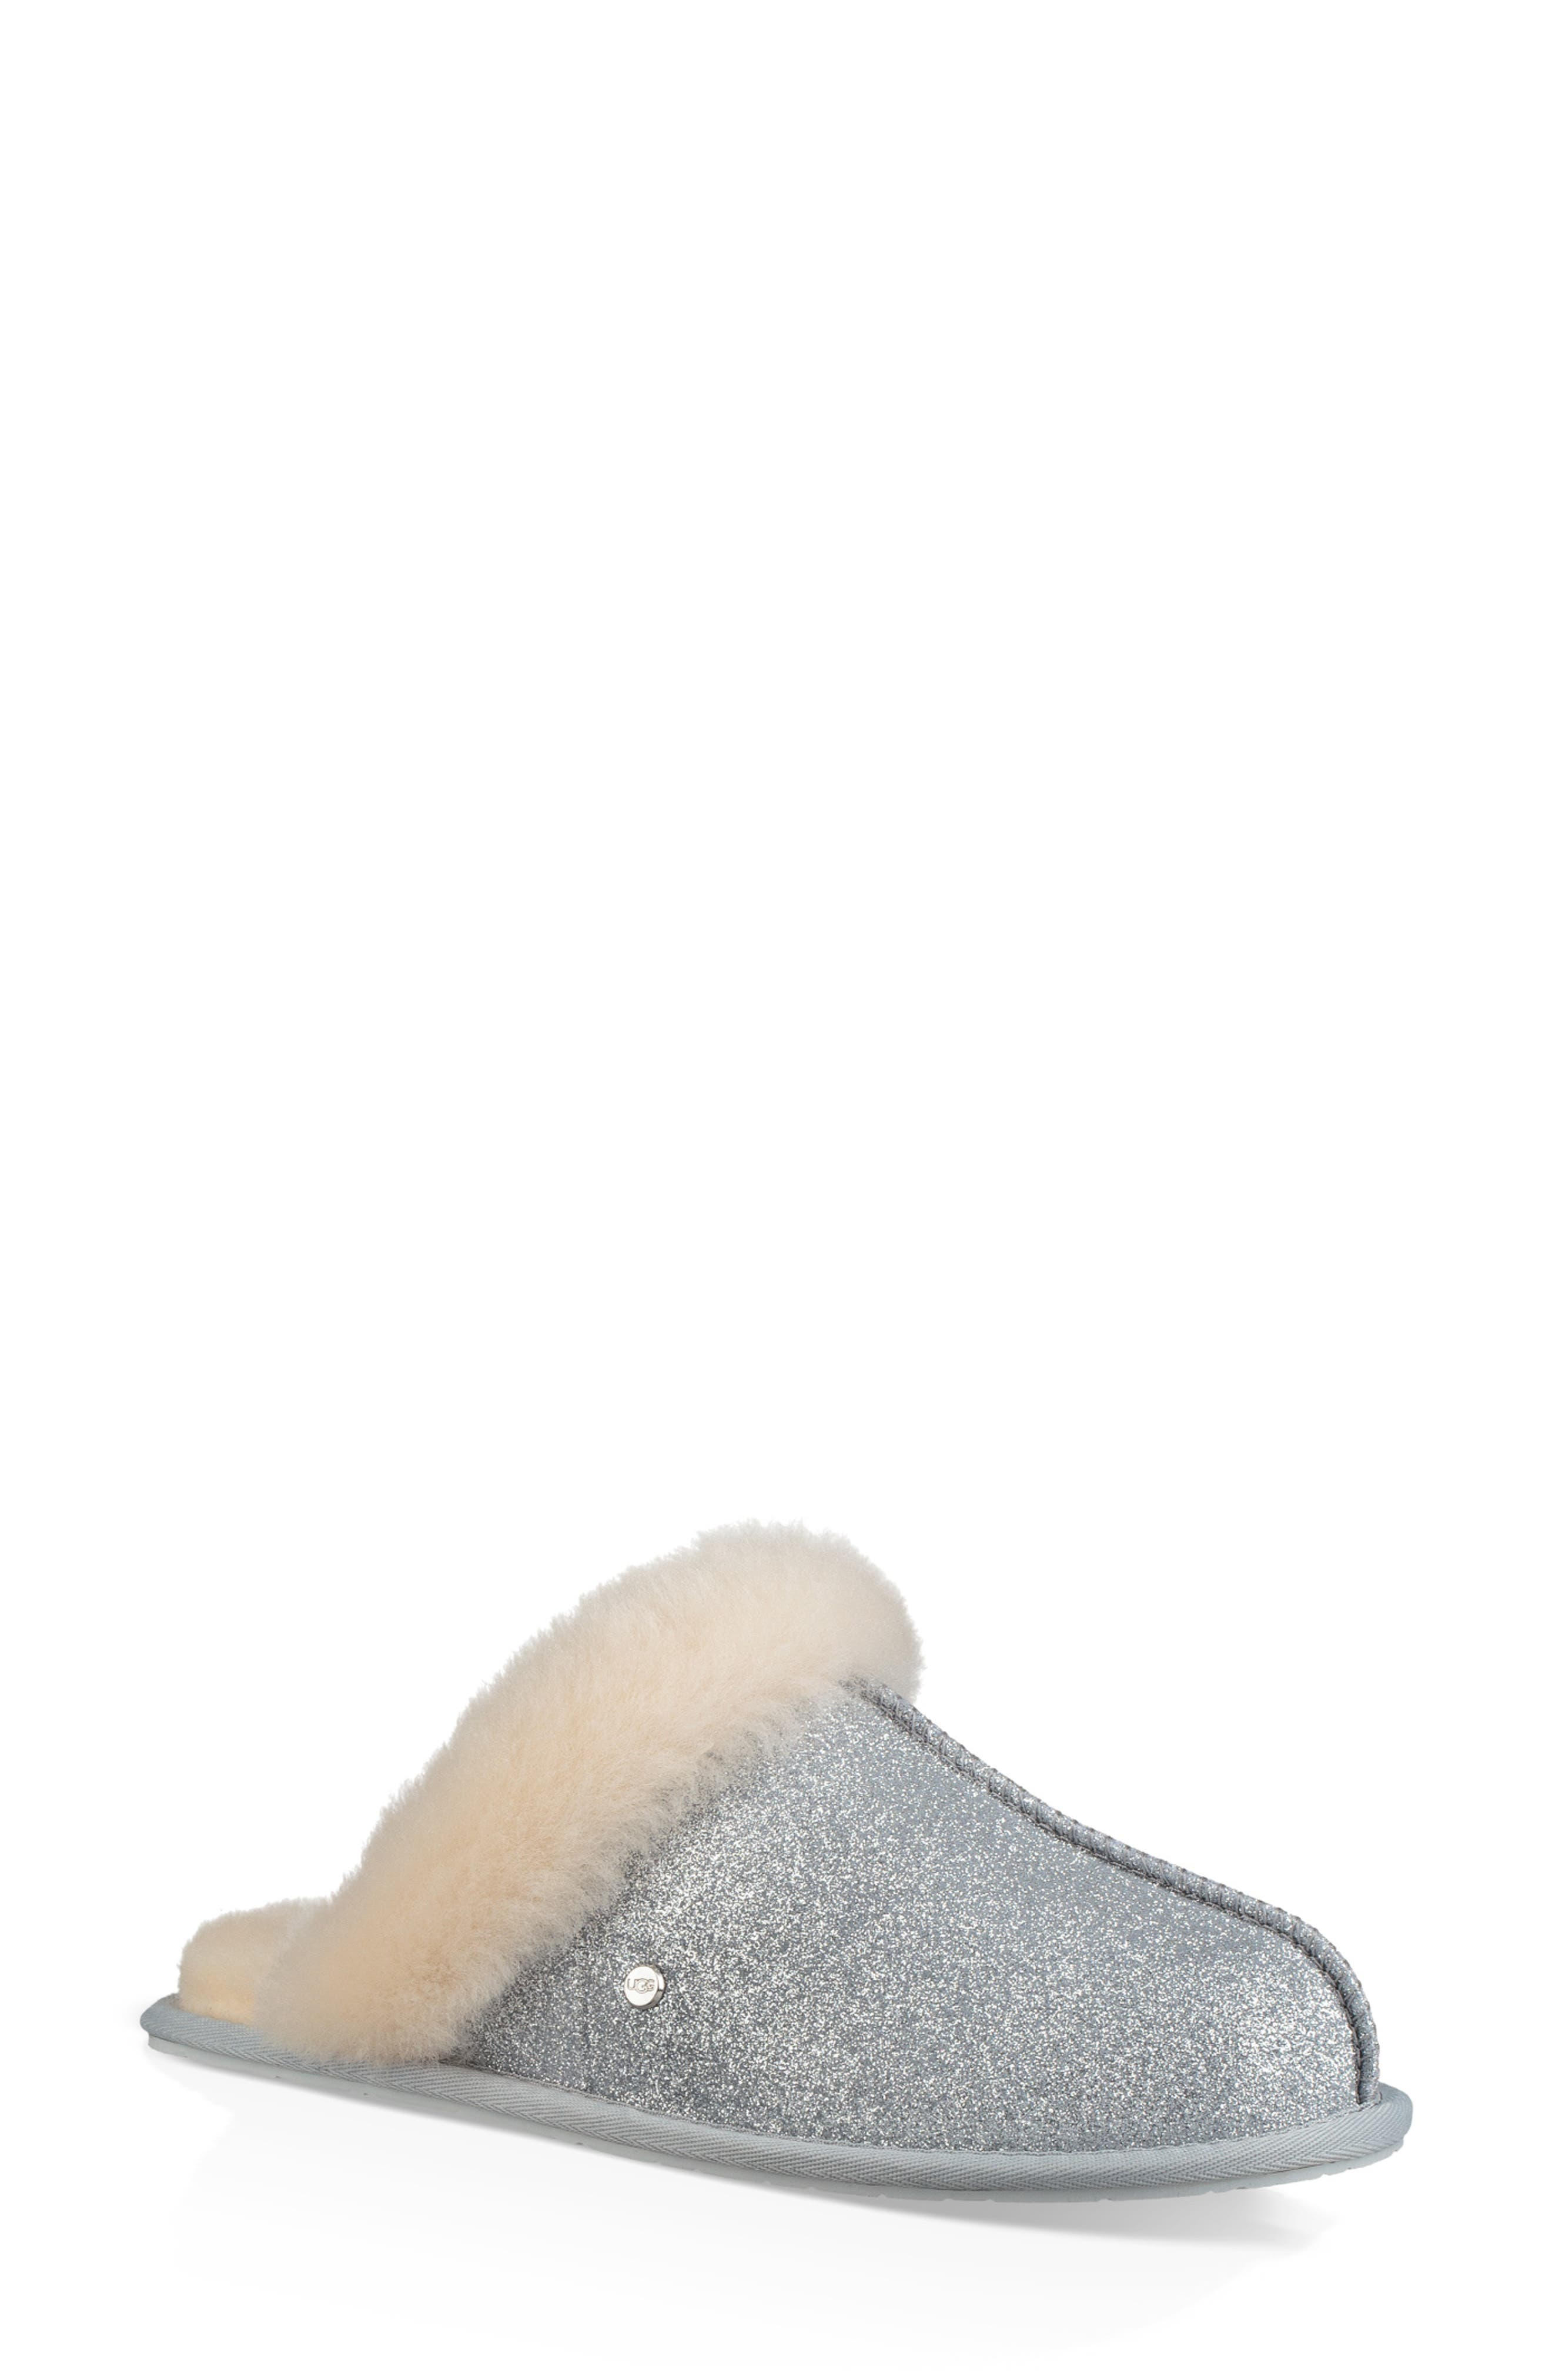 UGG<SUP>®</SUP>, Scuffette II Sparkle Genuine Shearling Slipper, Main thumbnail 1, color, SILVER